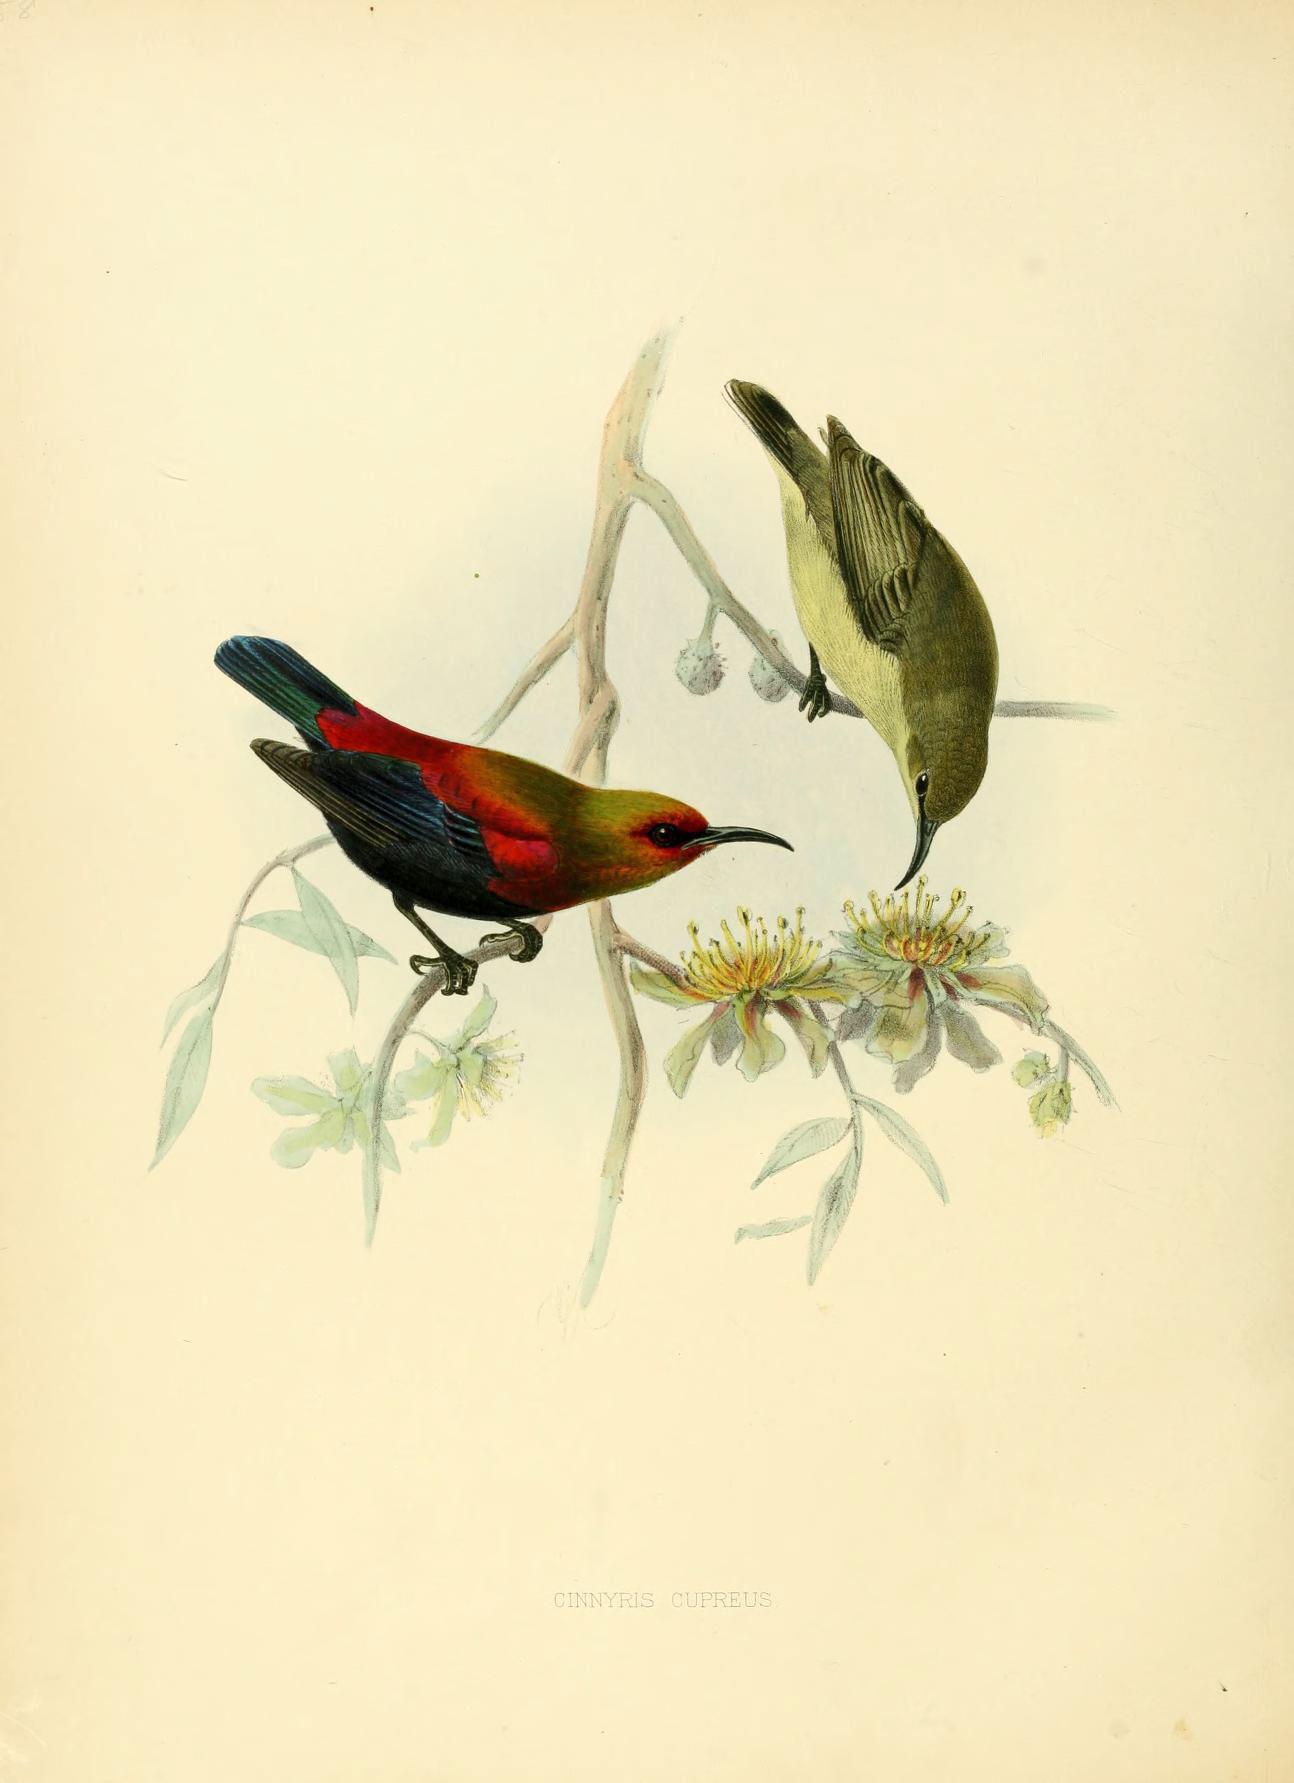 Image of Copper Sunbird